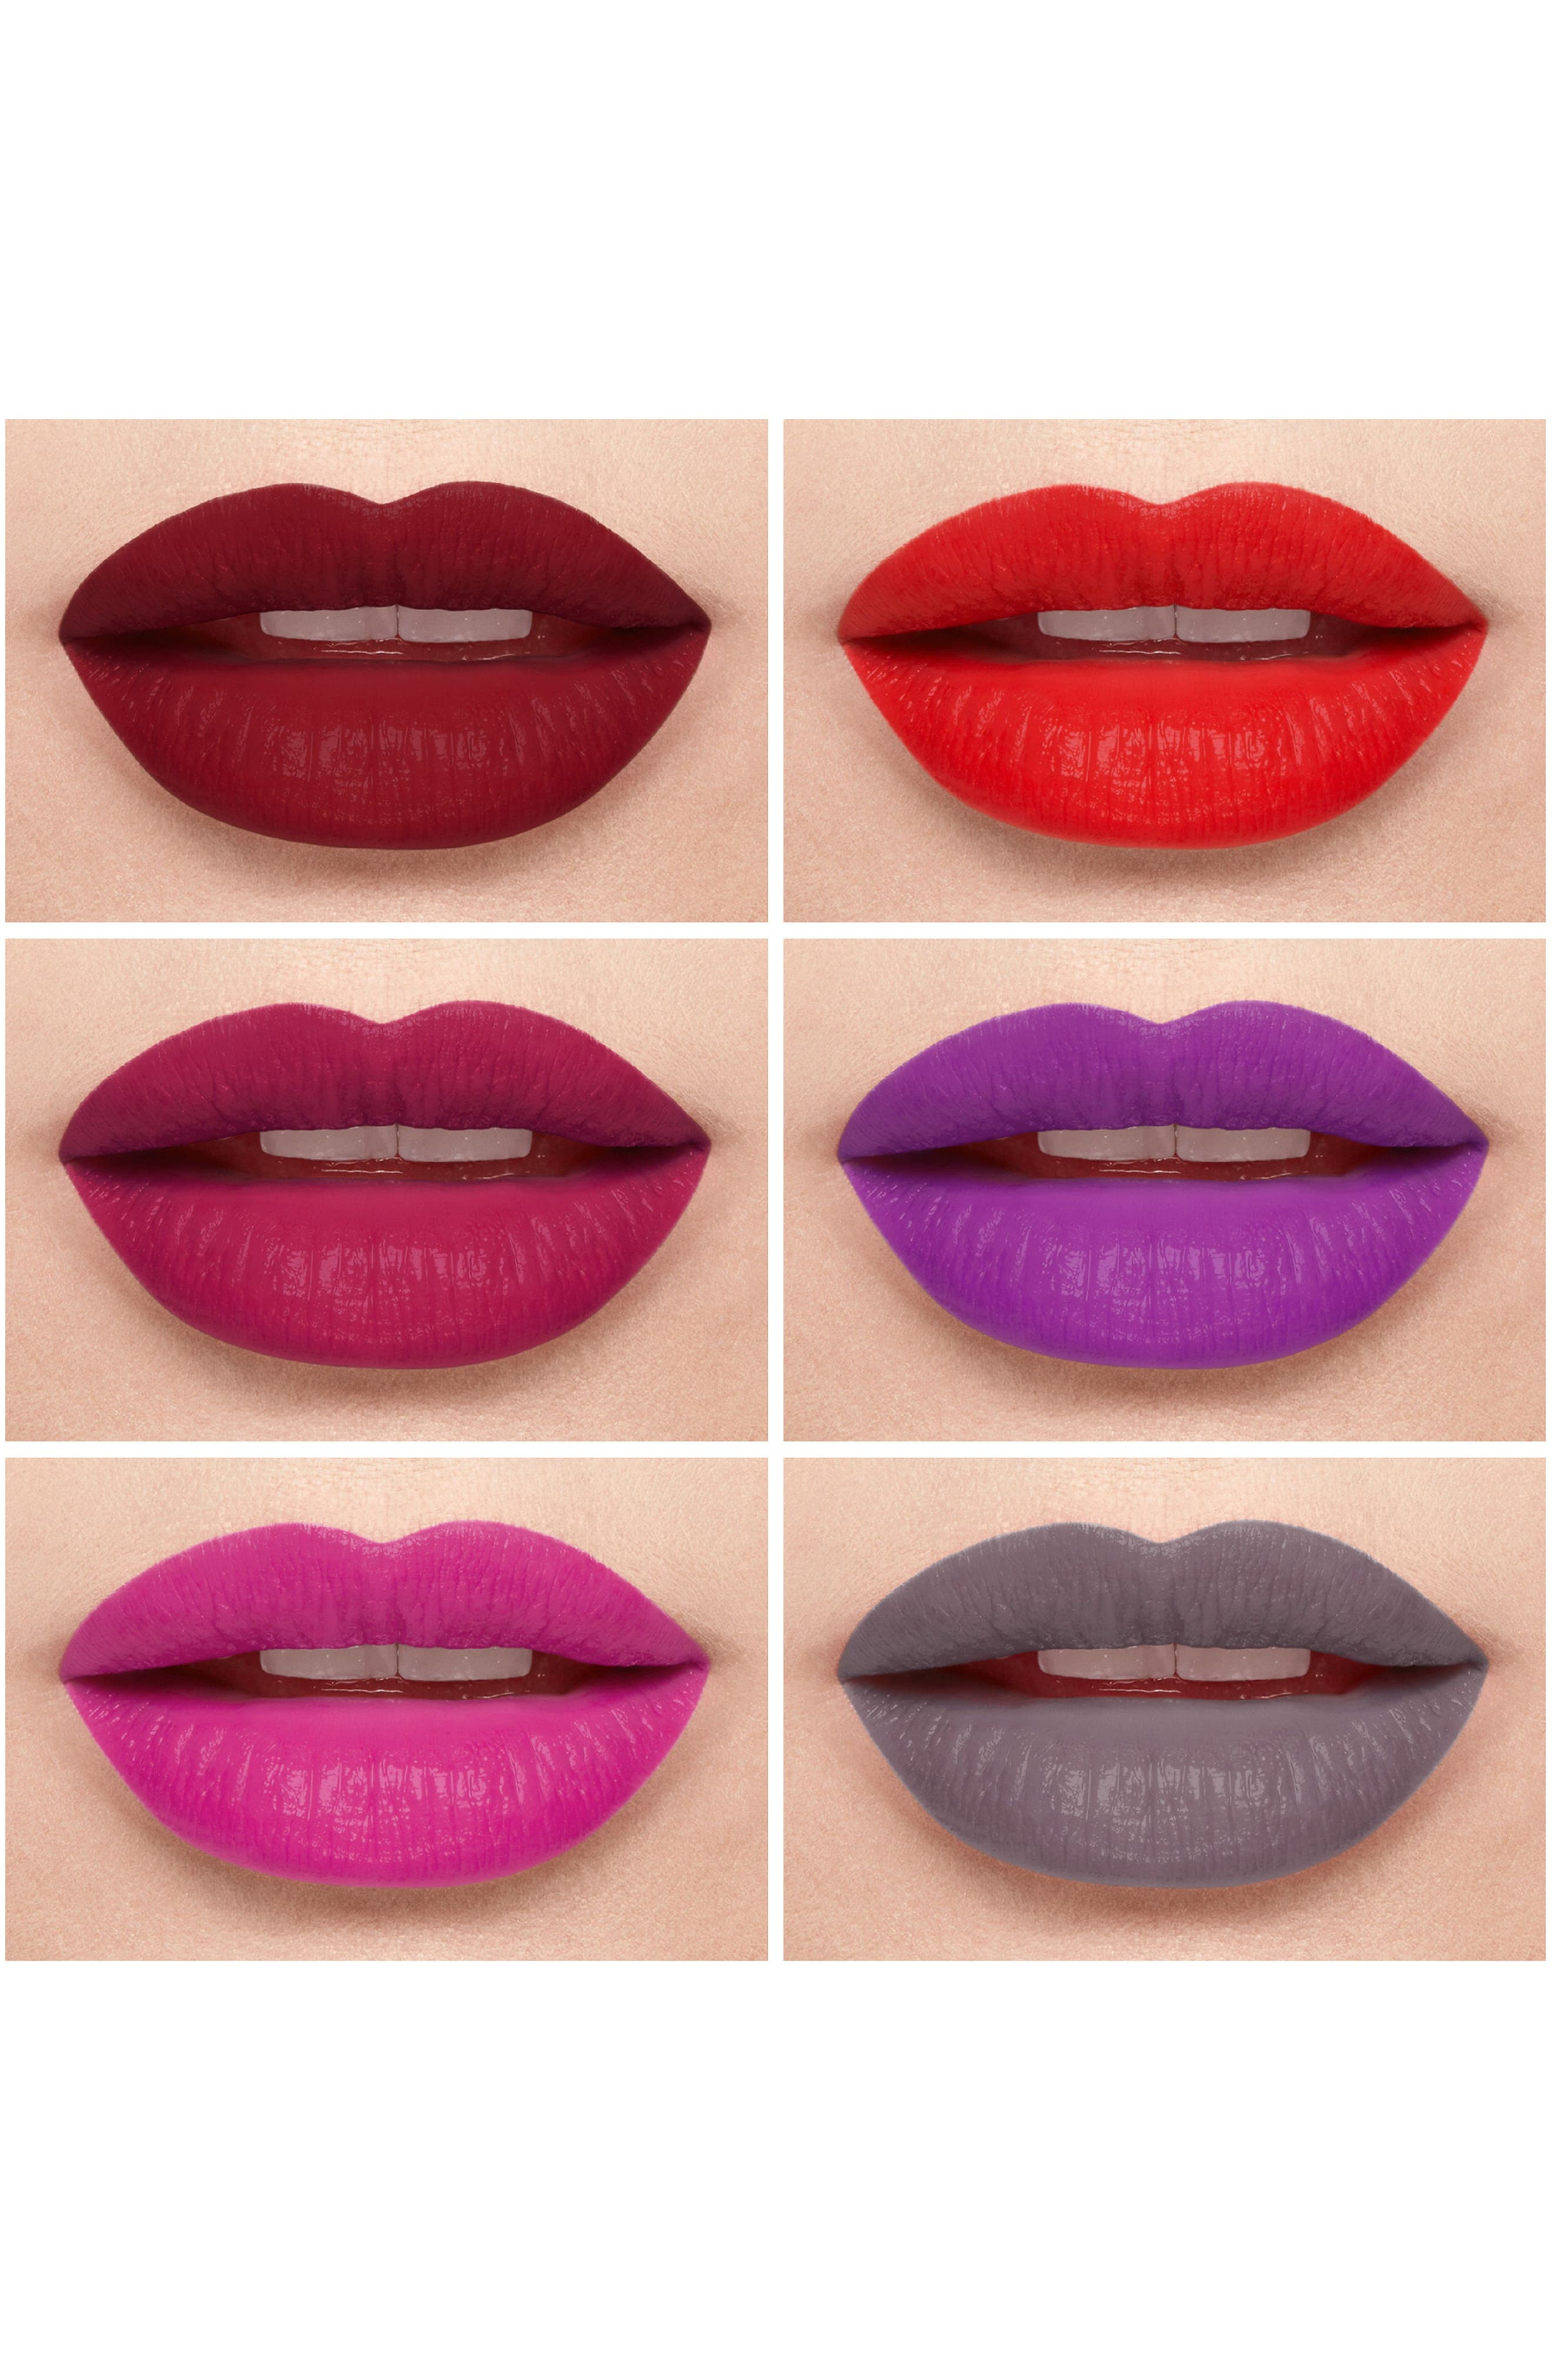 Be Legendary Pucker Up Lipstick Palette,                             Alternate thumbnail 2, color,                             BOLD